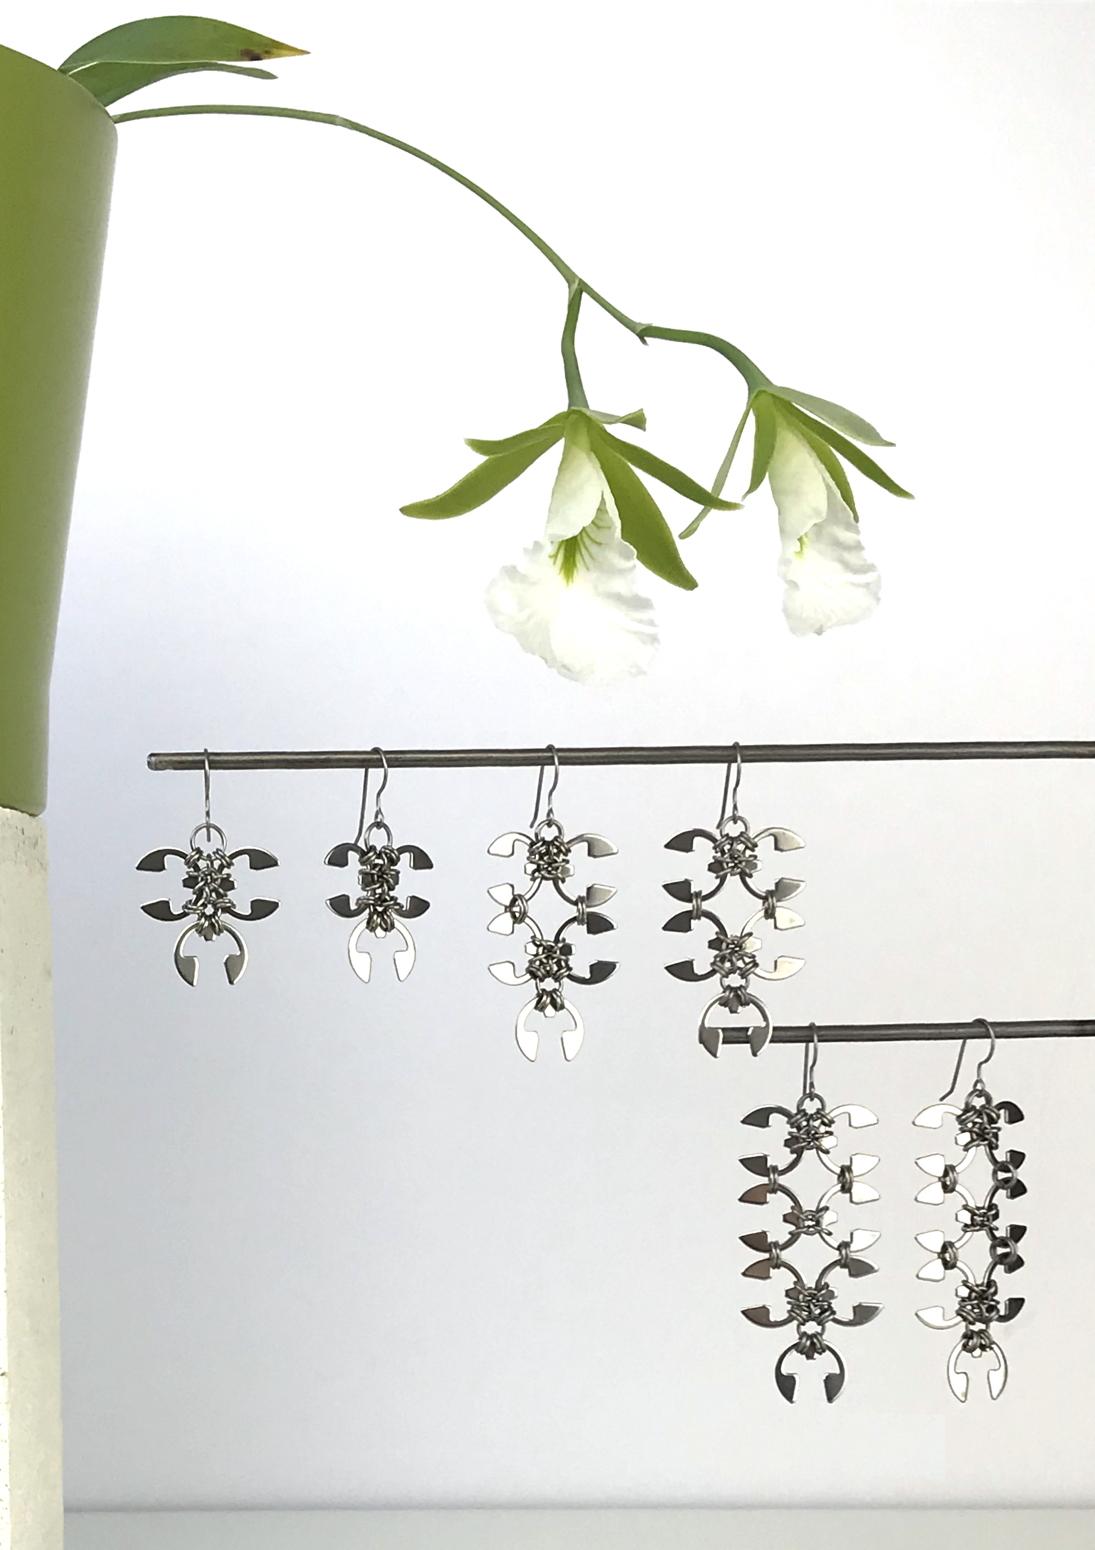 Wraptillion's Ivy Earrings, Short Wisteria Earrings, and Long Wisteria Earrings with blooming orchid Encyclia mariae.